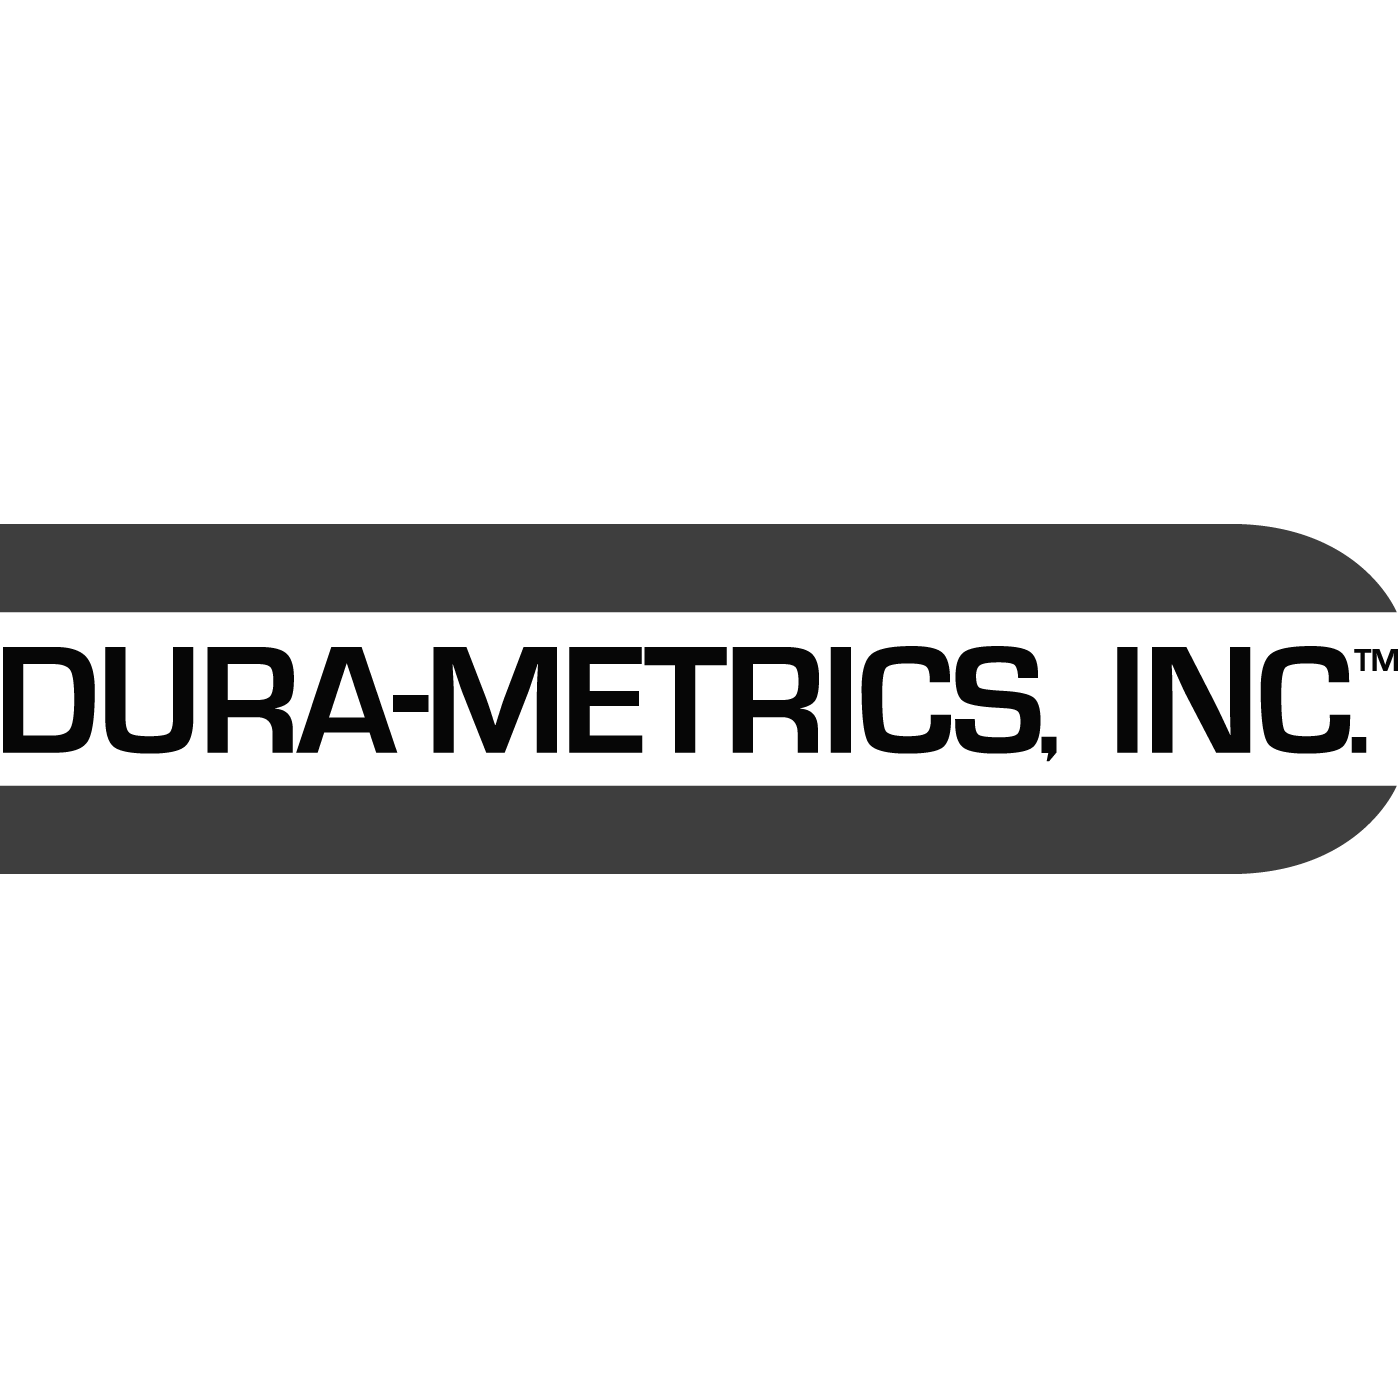 DuraMetrics_LOGO_02_clr.png